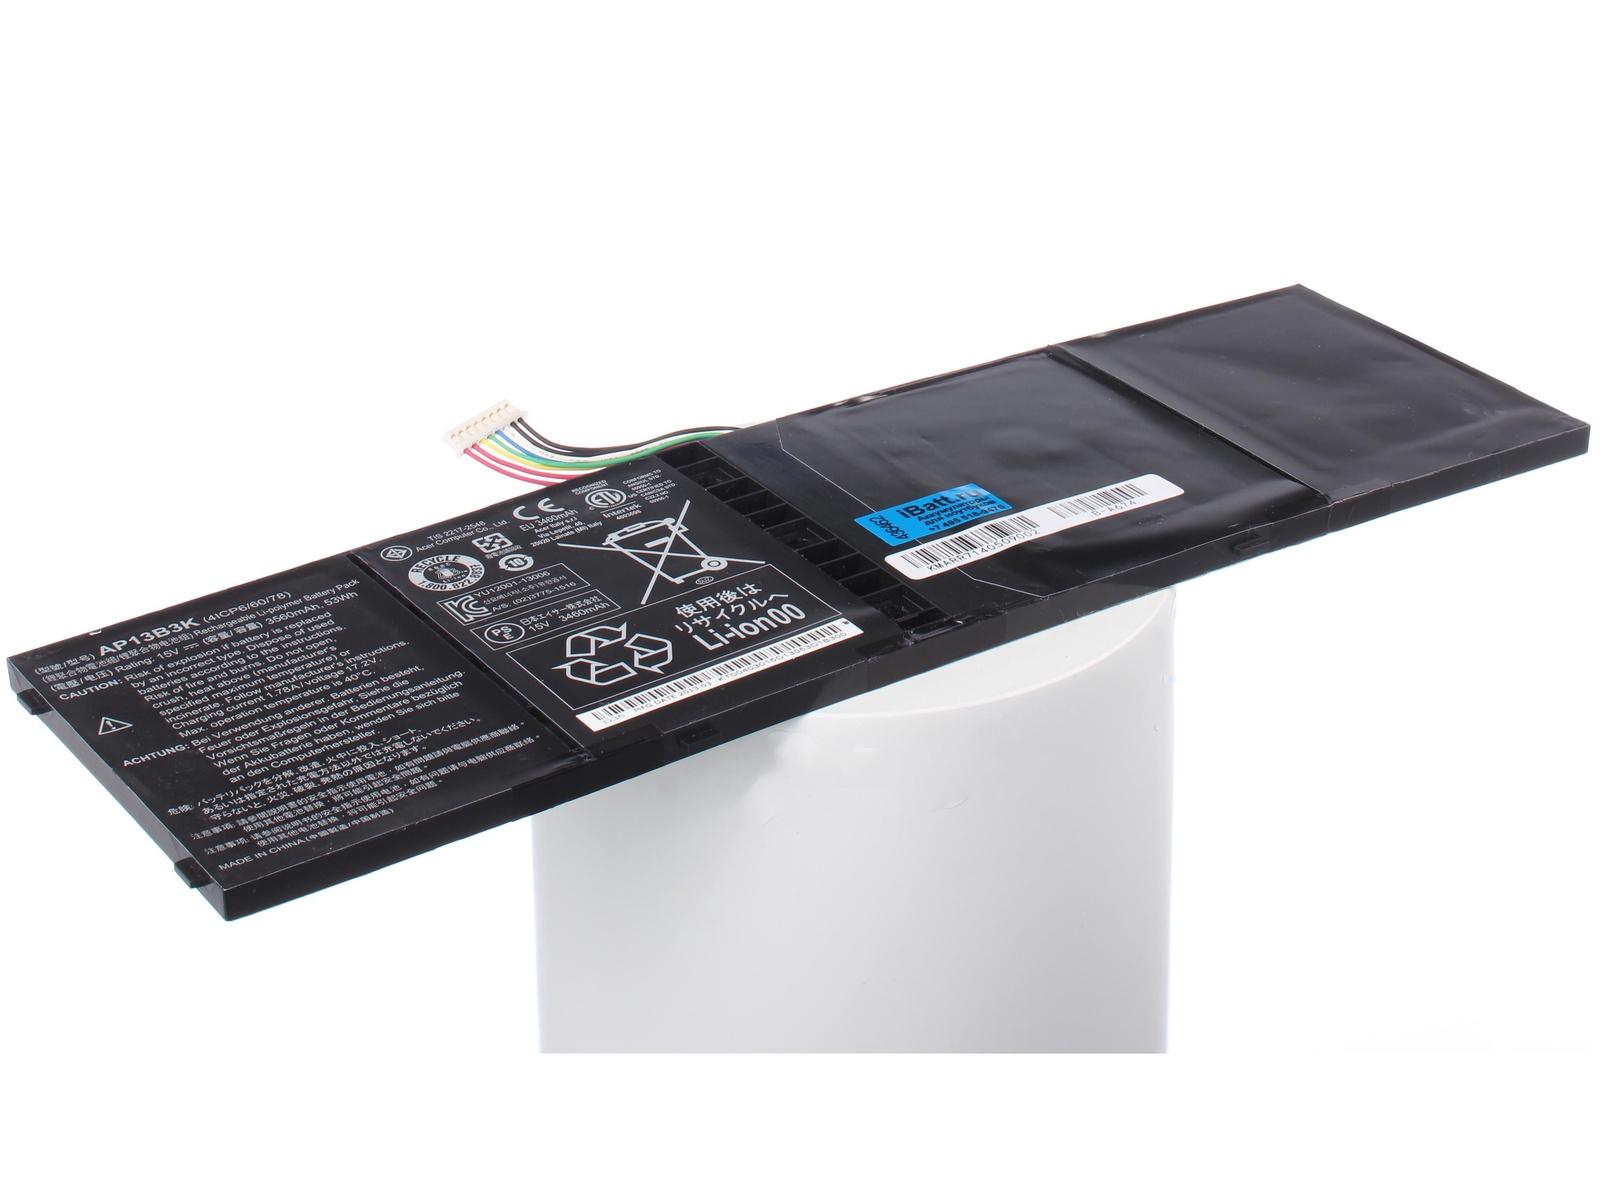 Аккумулятор для ноутбука iBatt для Acer Aspire V5-572PG-53338G50amm, Aspire M5-583P, Aspire R7-571G-73538G1Tass, Aspire R7-572-54206G1Tass, Aspire V7-482PG-74508G52t, Aspire V7-582P, Aspire ES1-511-C09C, Aspire R7-572G-74508G1Ta ноутбук acer aspire es1 572 31vt nx gkqer 006